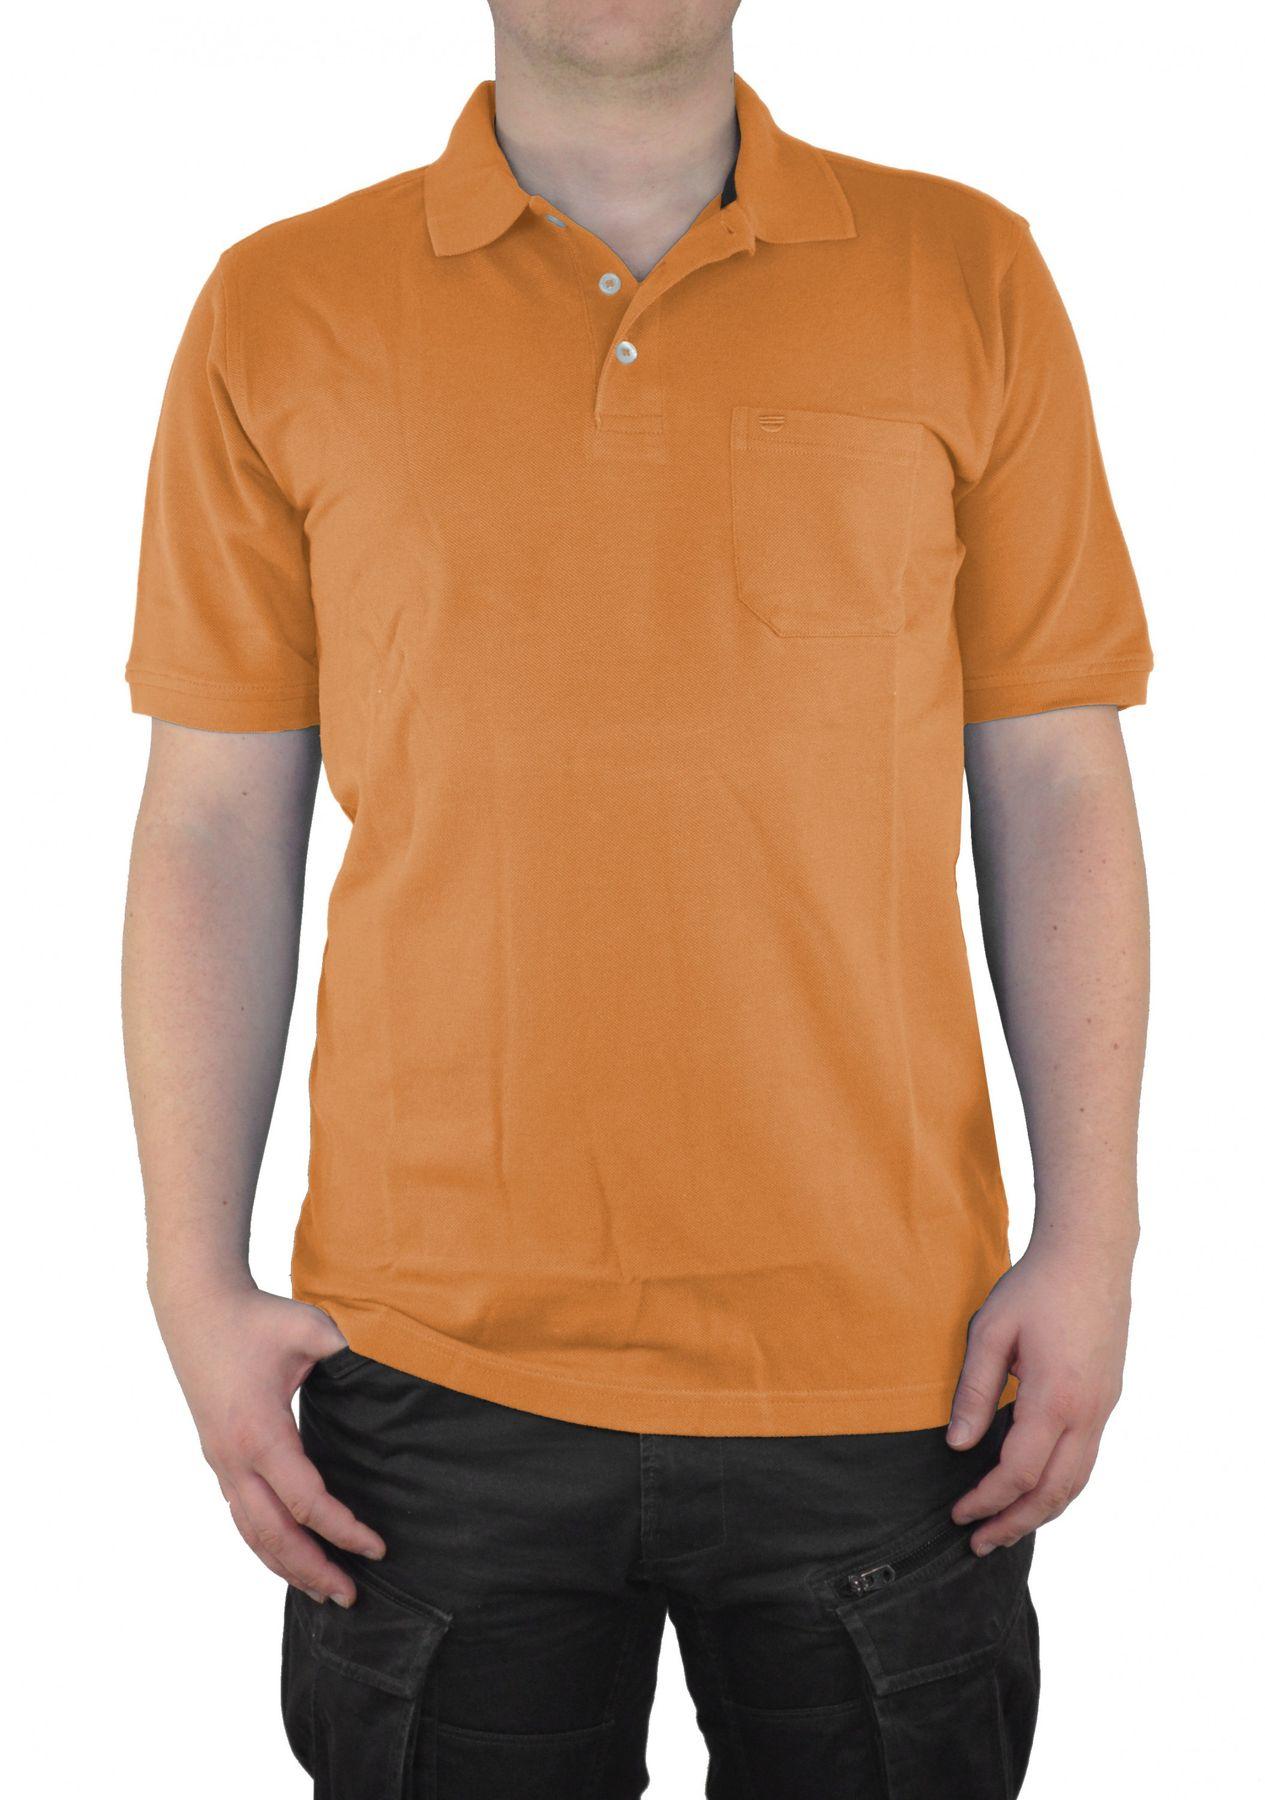 Redmond - Regular Fit - Herren Polo Shirt in verschiedenen Farben (900 A) – Bild 12